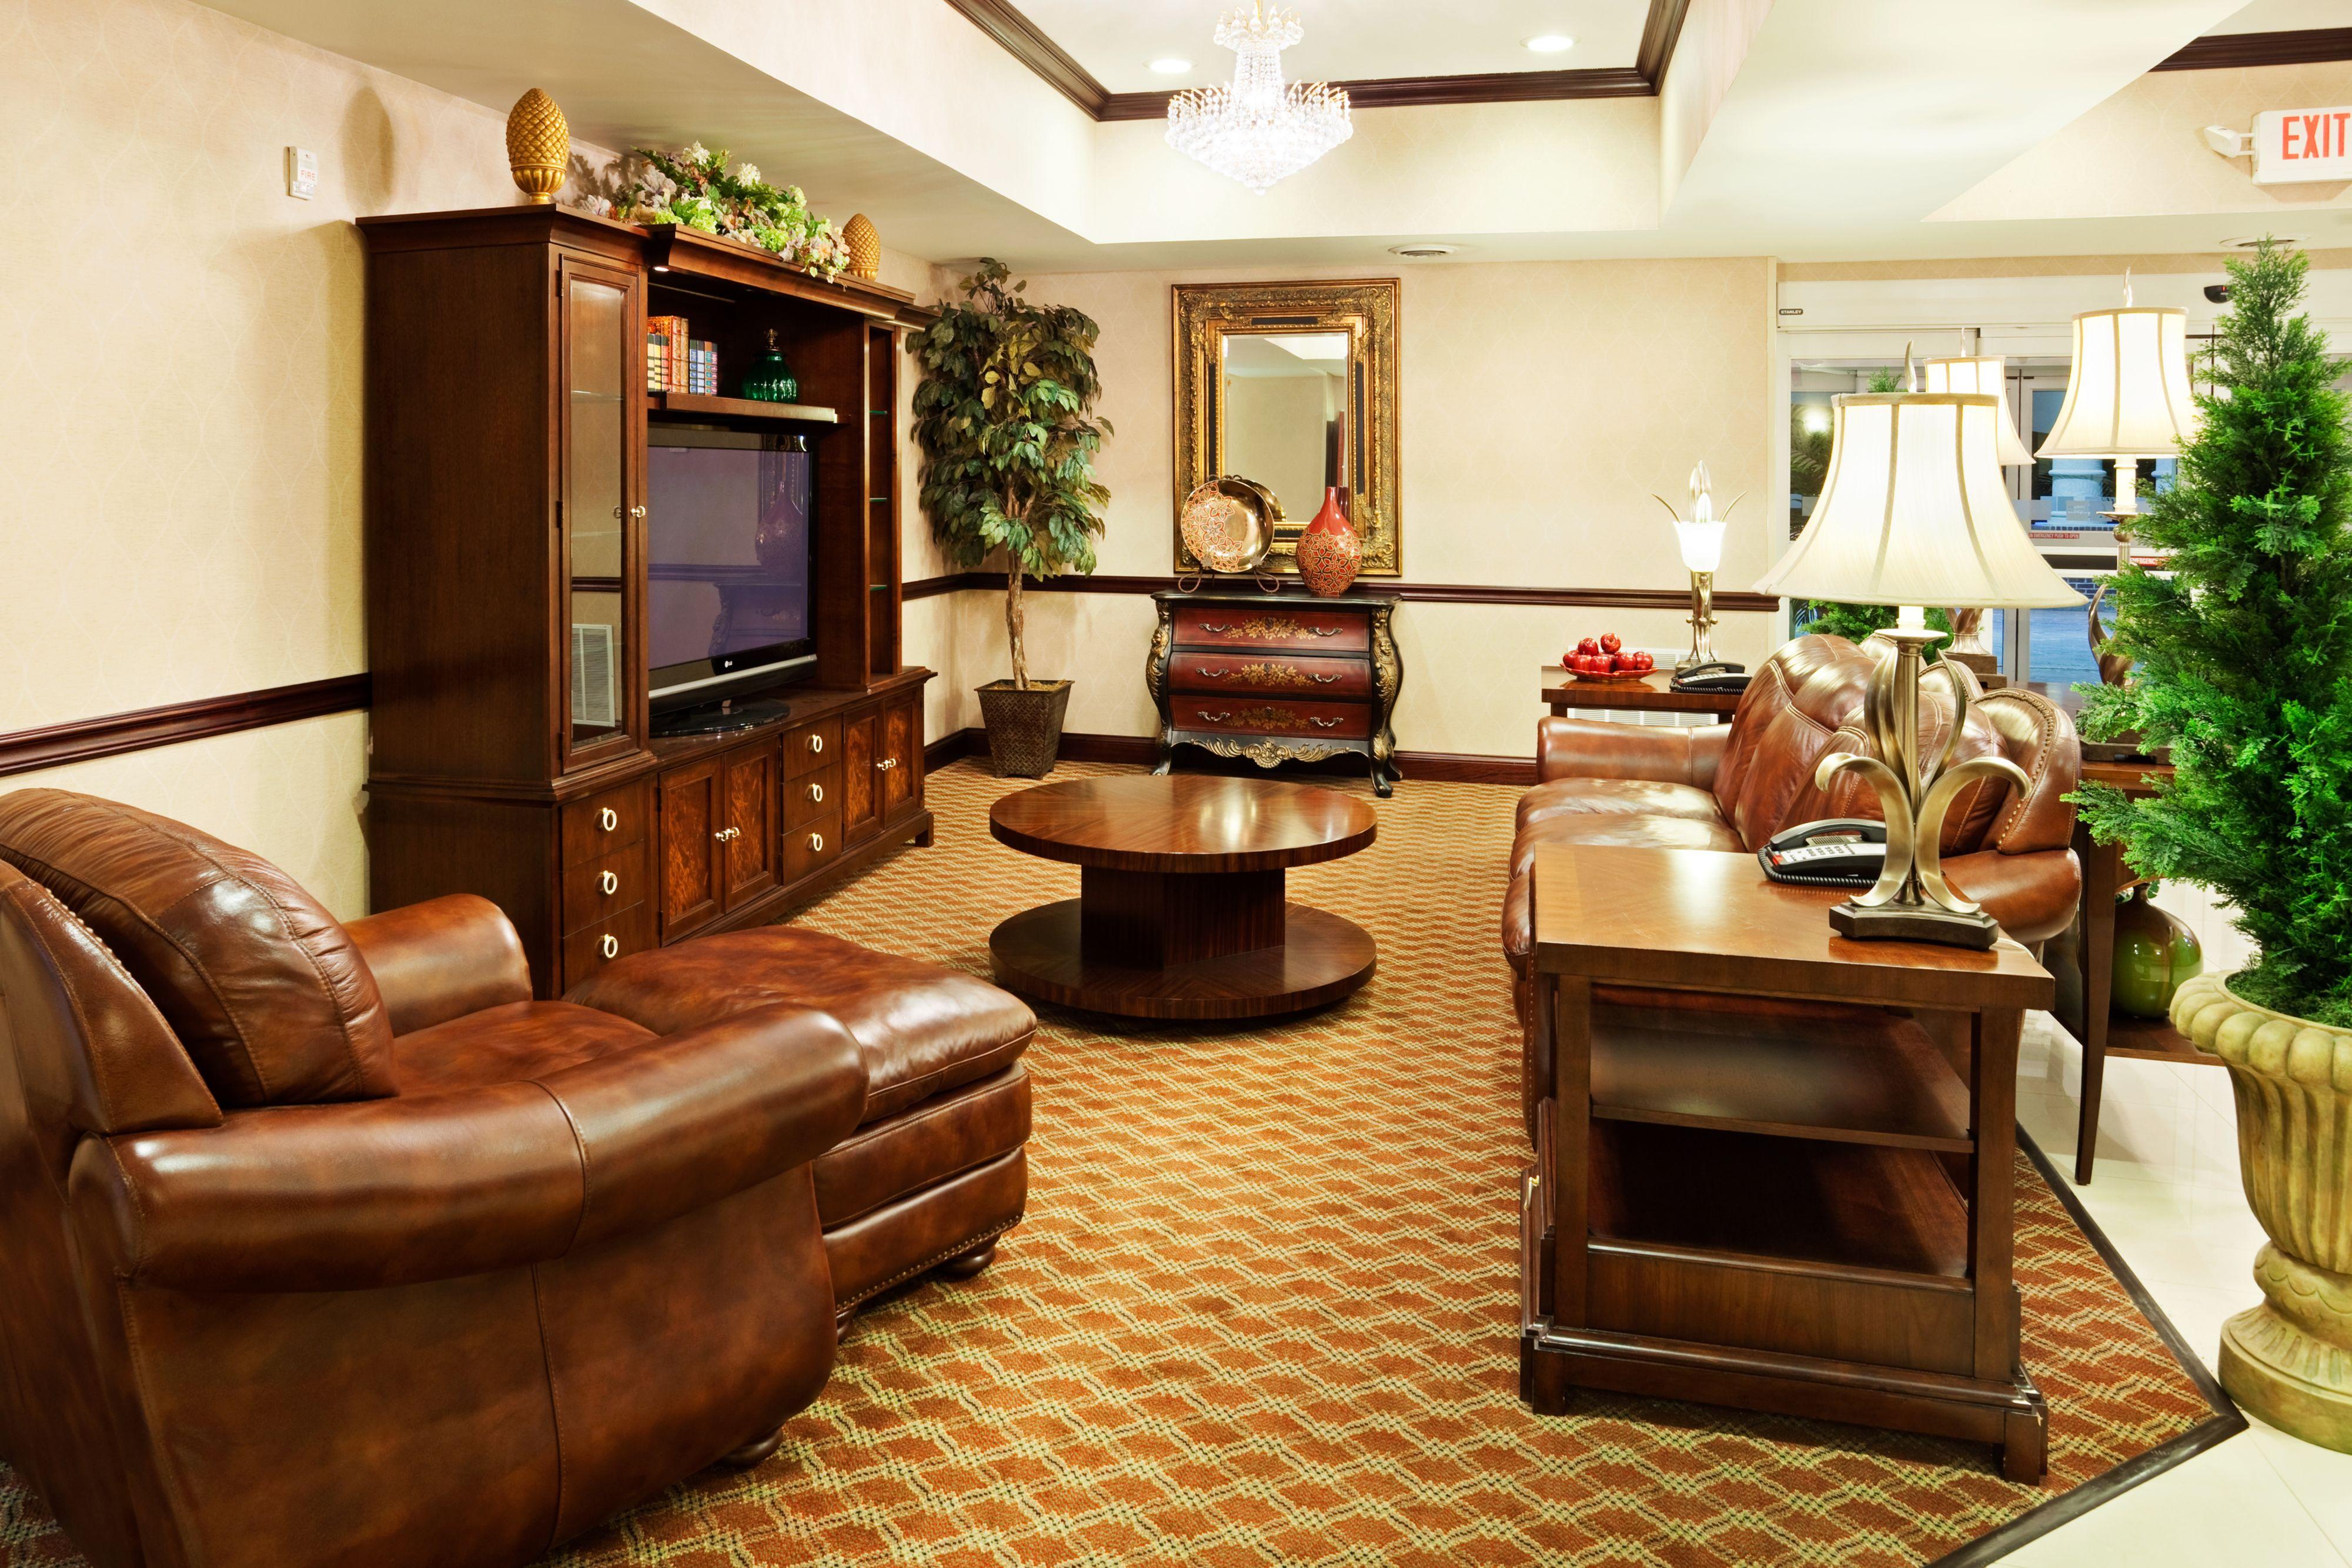 Holiday Inn Express Carrollton image 3